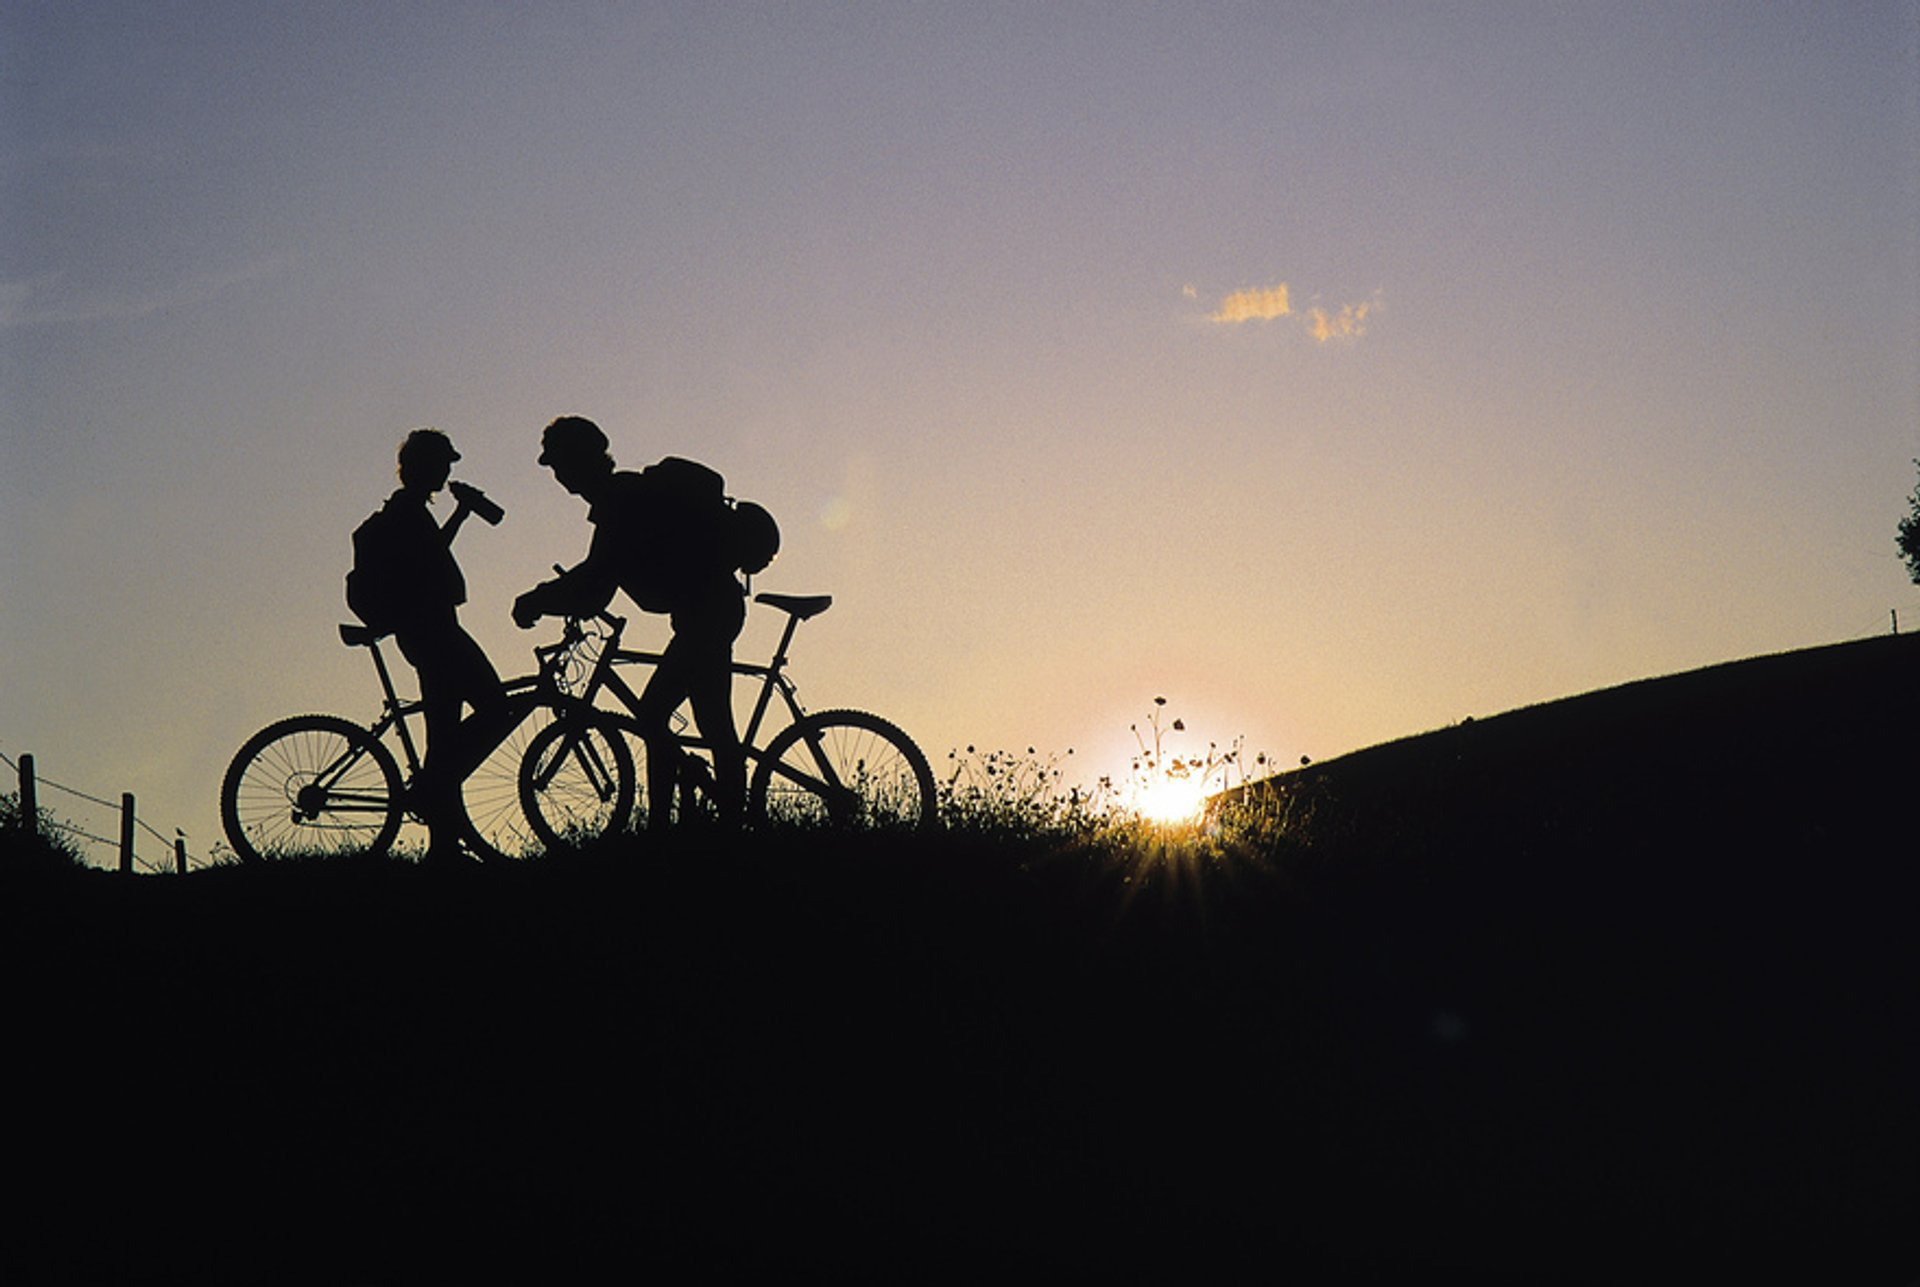 Mountain Biking in Austria 2020 - Best Time